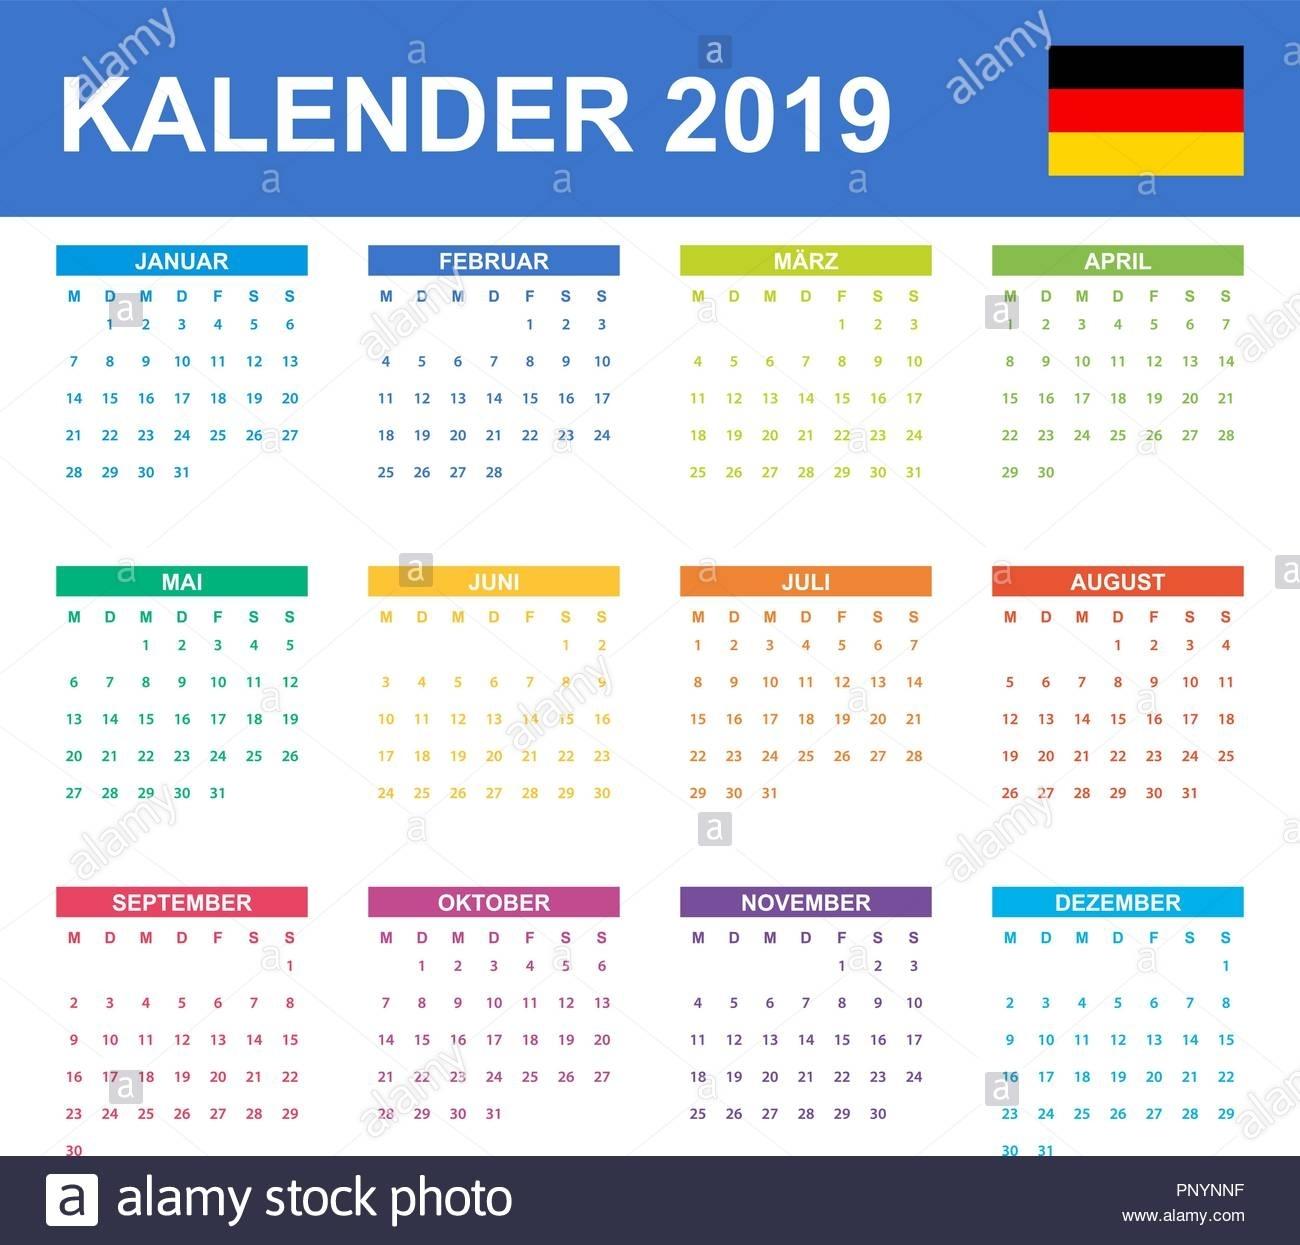 German Calendar For 2019. Scheduler, Agenda Or Diary